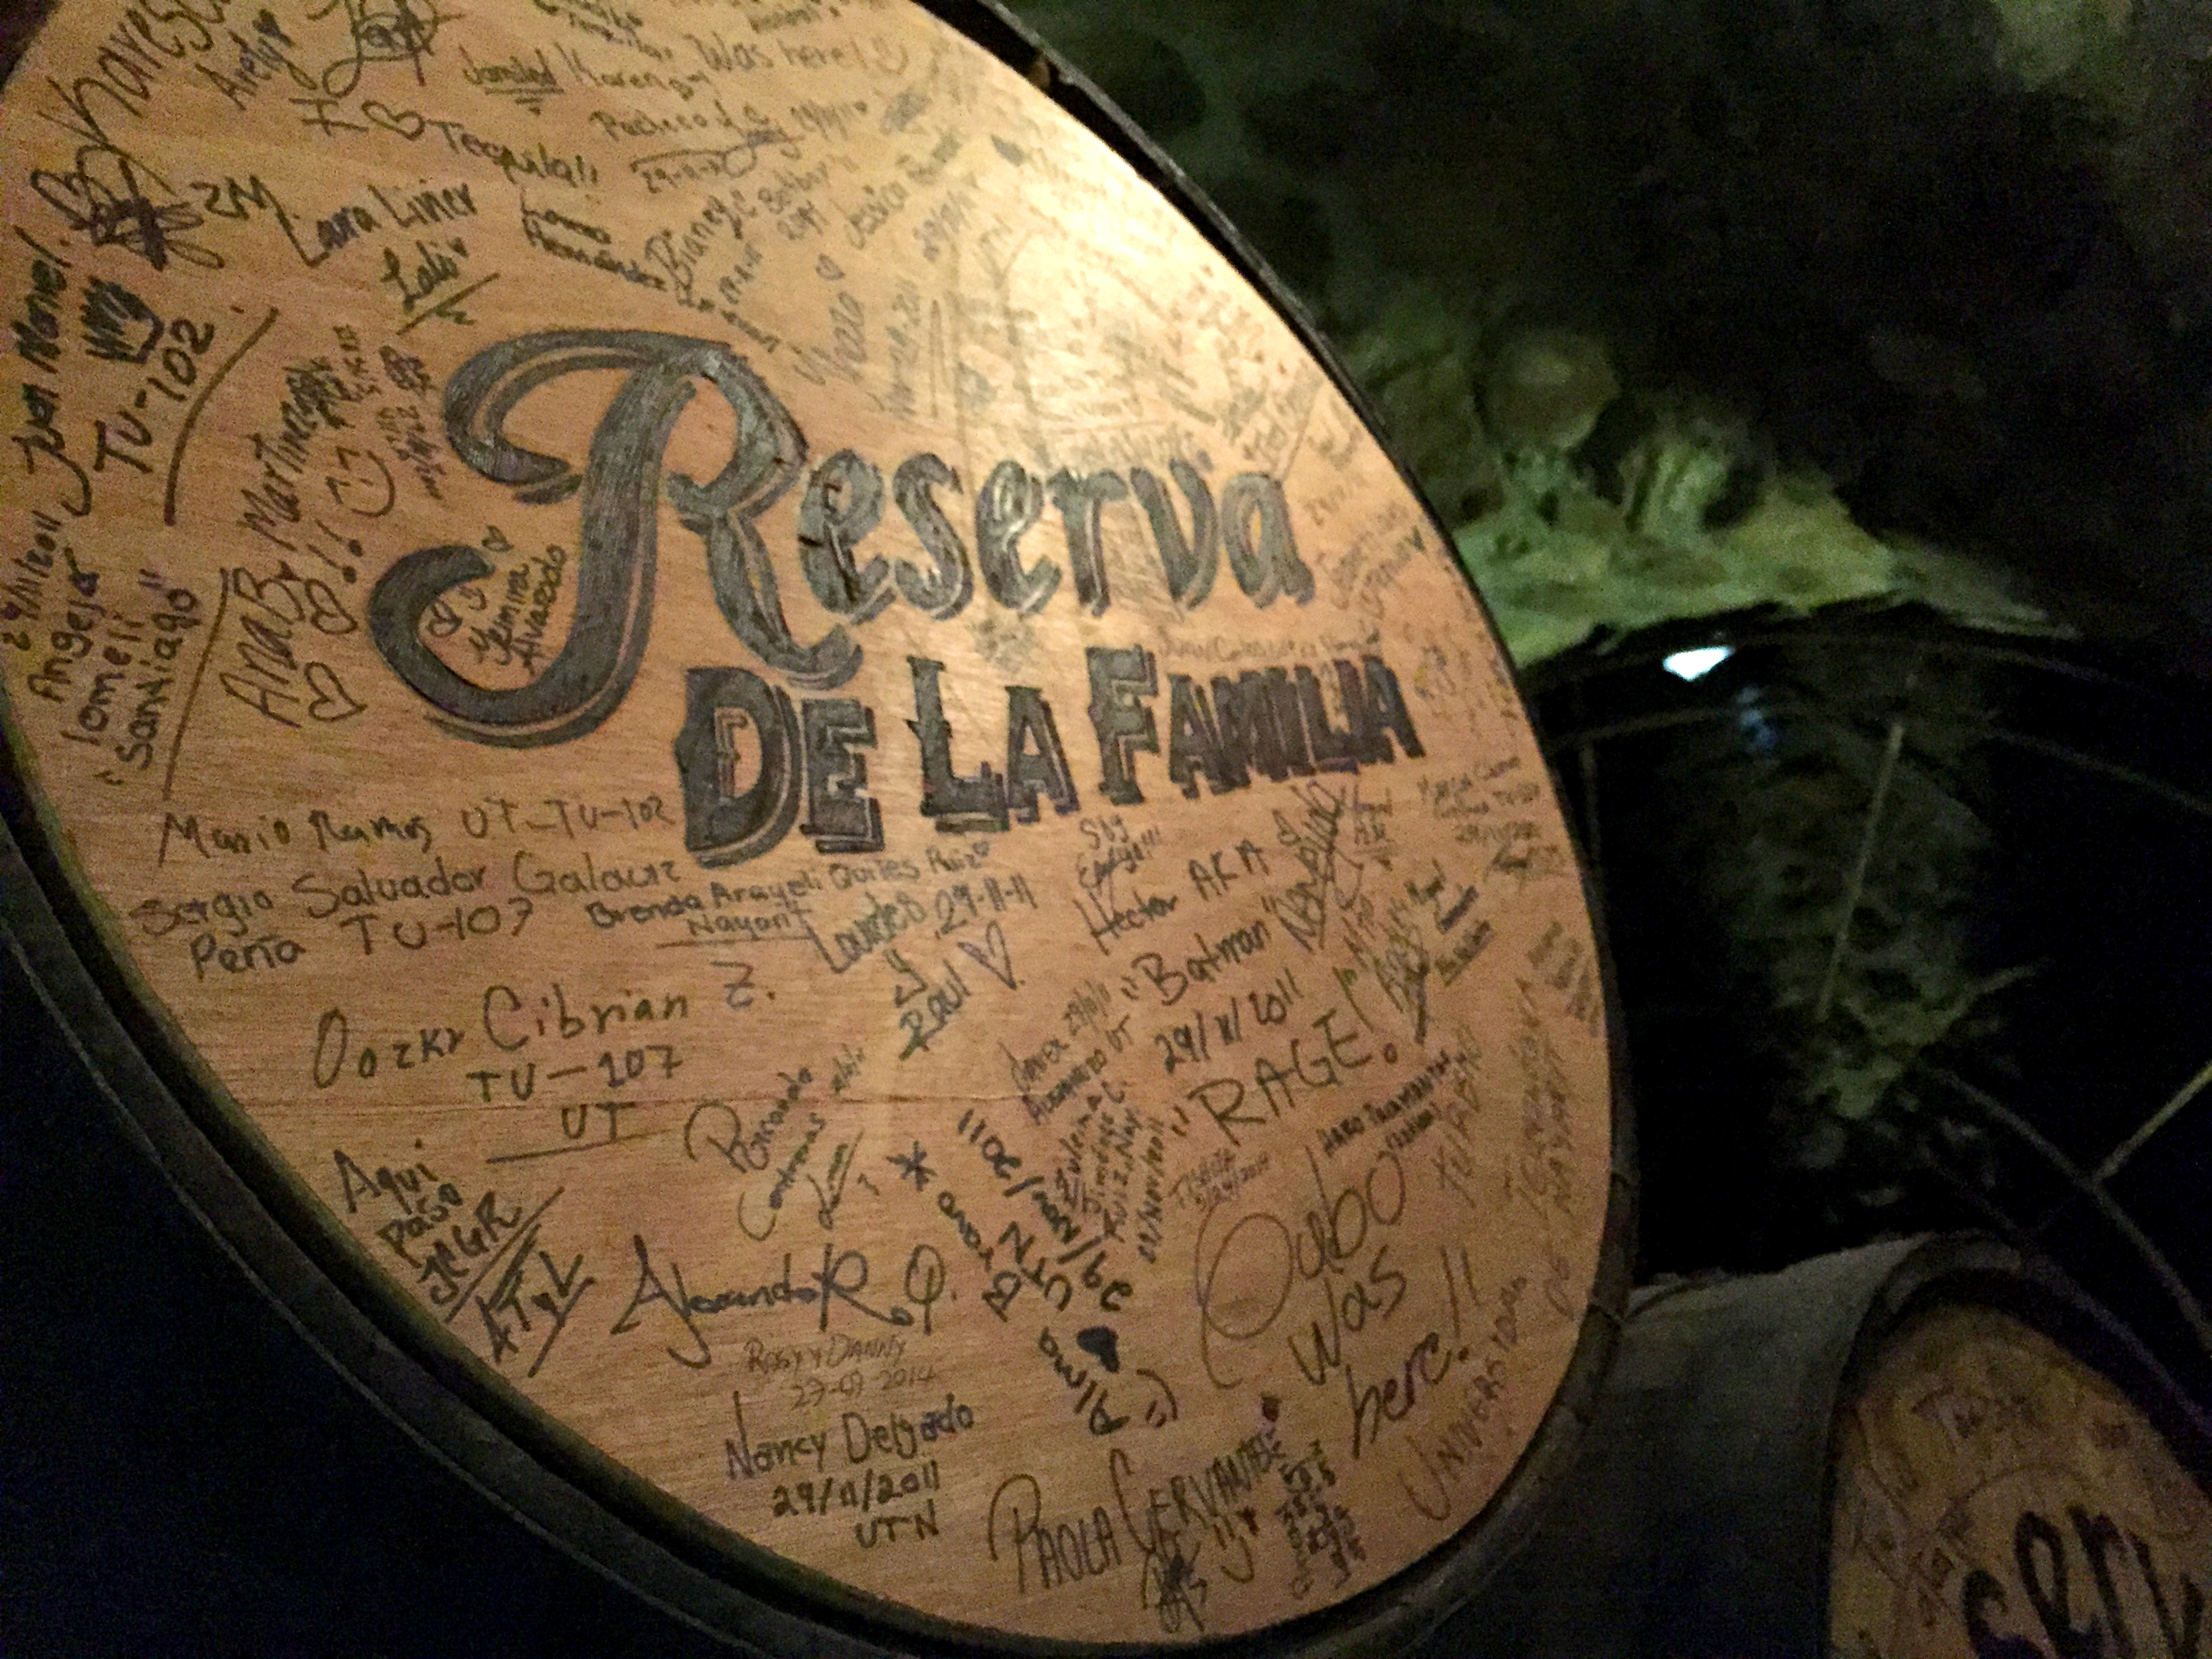 Barrel in the Reserva de la Familia Cellar at La Rojeña in Tequila